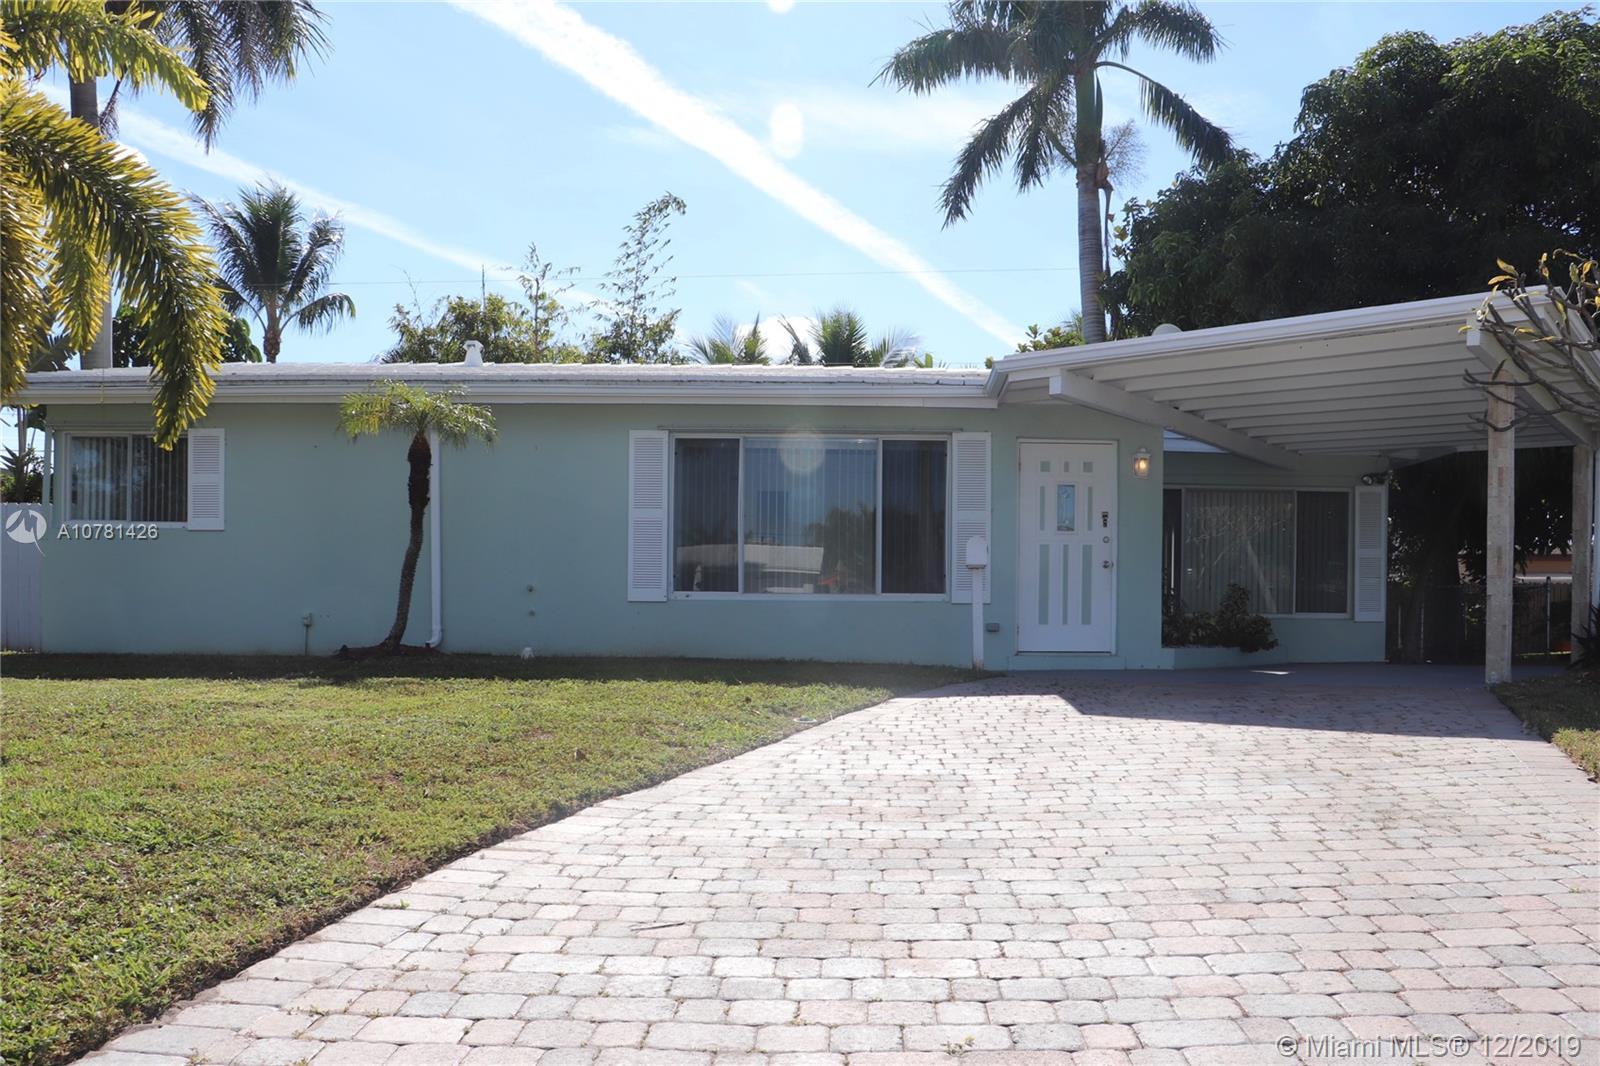 920 SE 15th St, Deerfield Beach, FL 33441 - Deerfield Beach, FL real estate listing